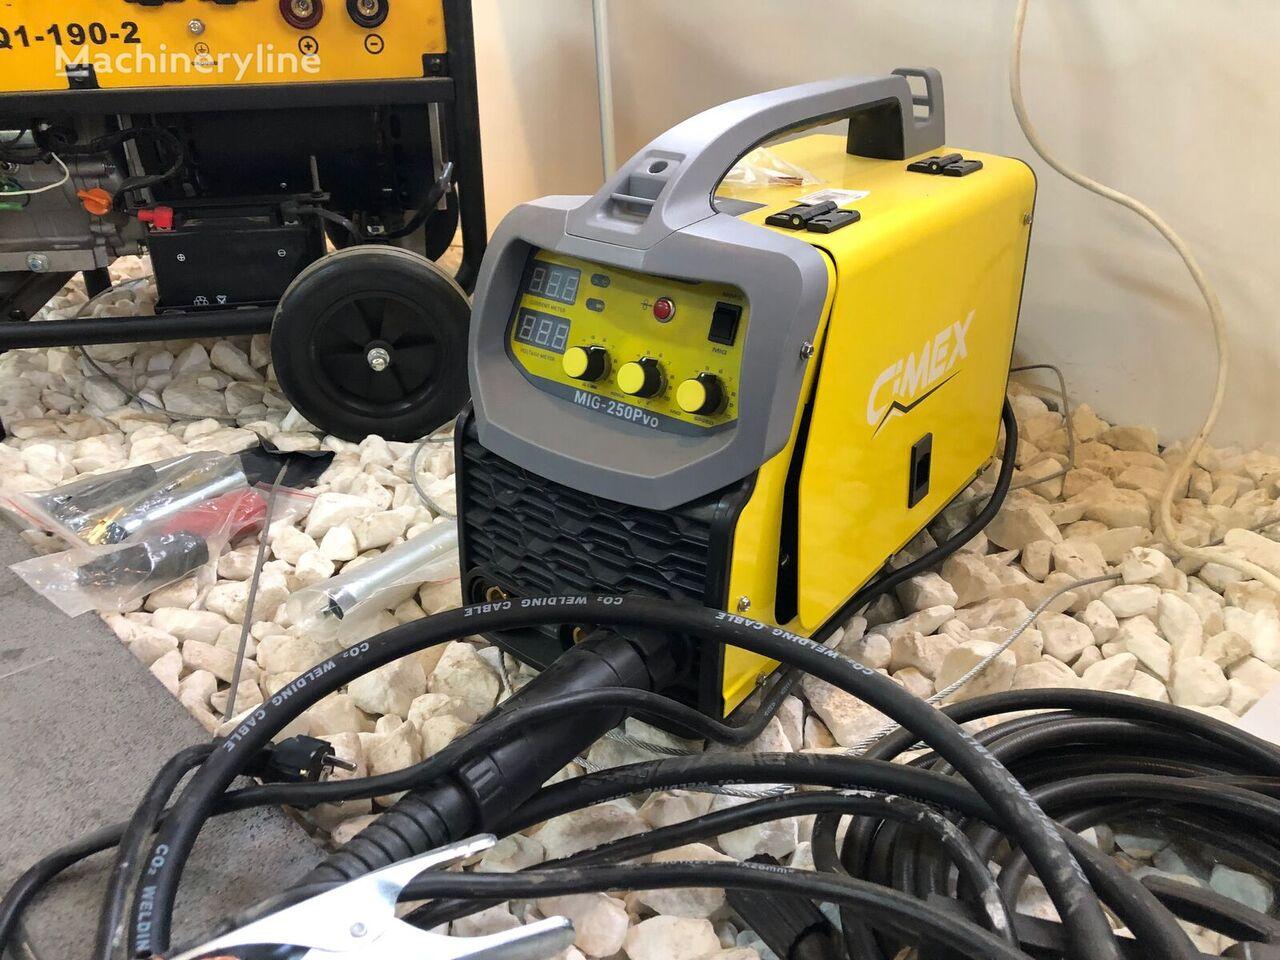 nov oprema za varjenje CIMEX ARC Welding Inverter with Mask MIG 250 Pvo